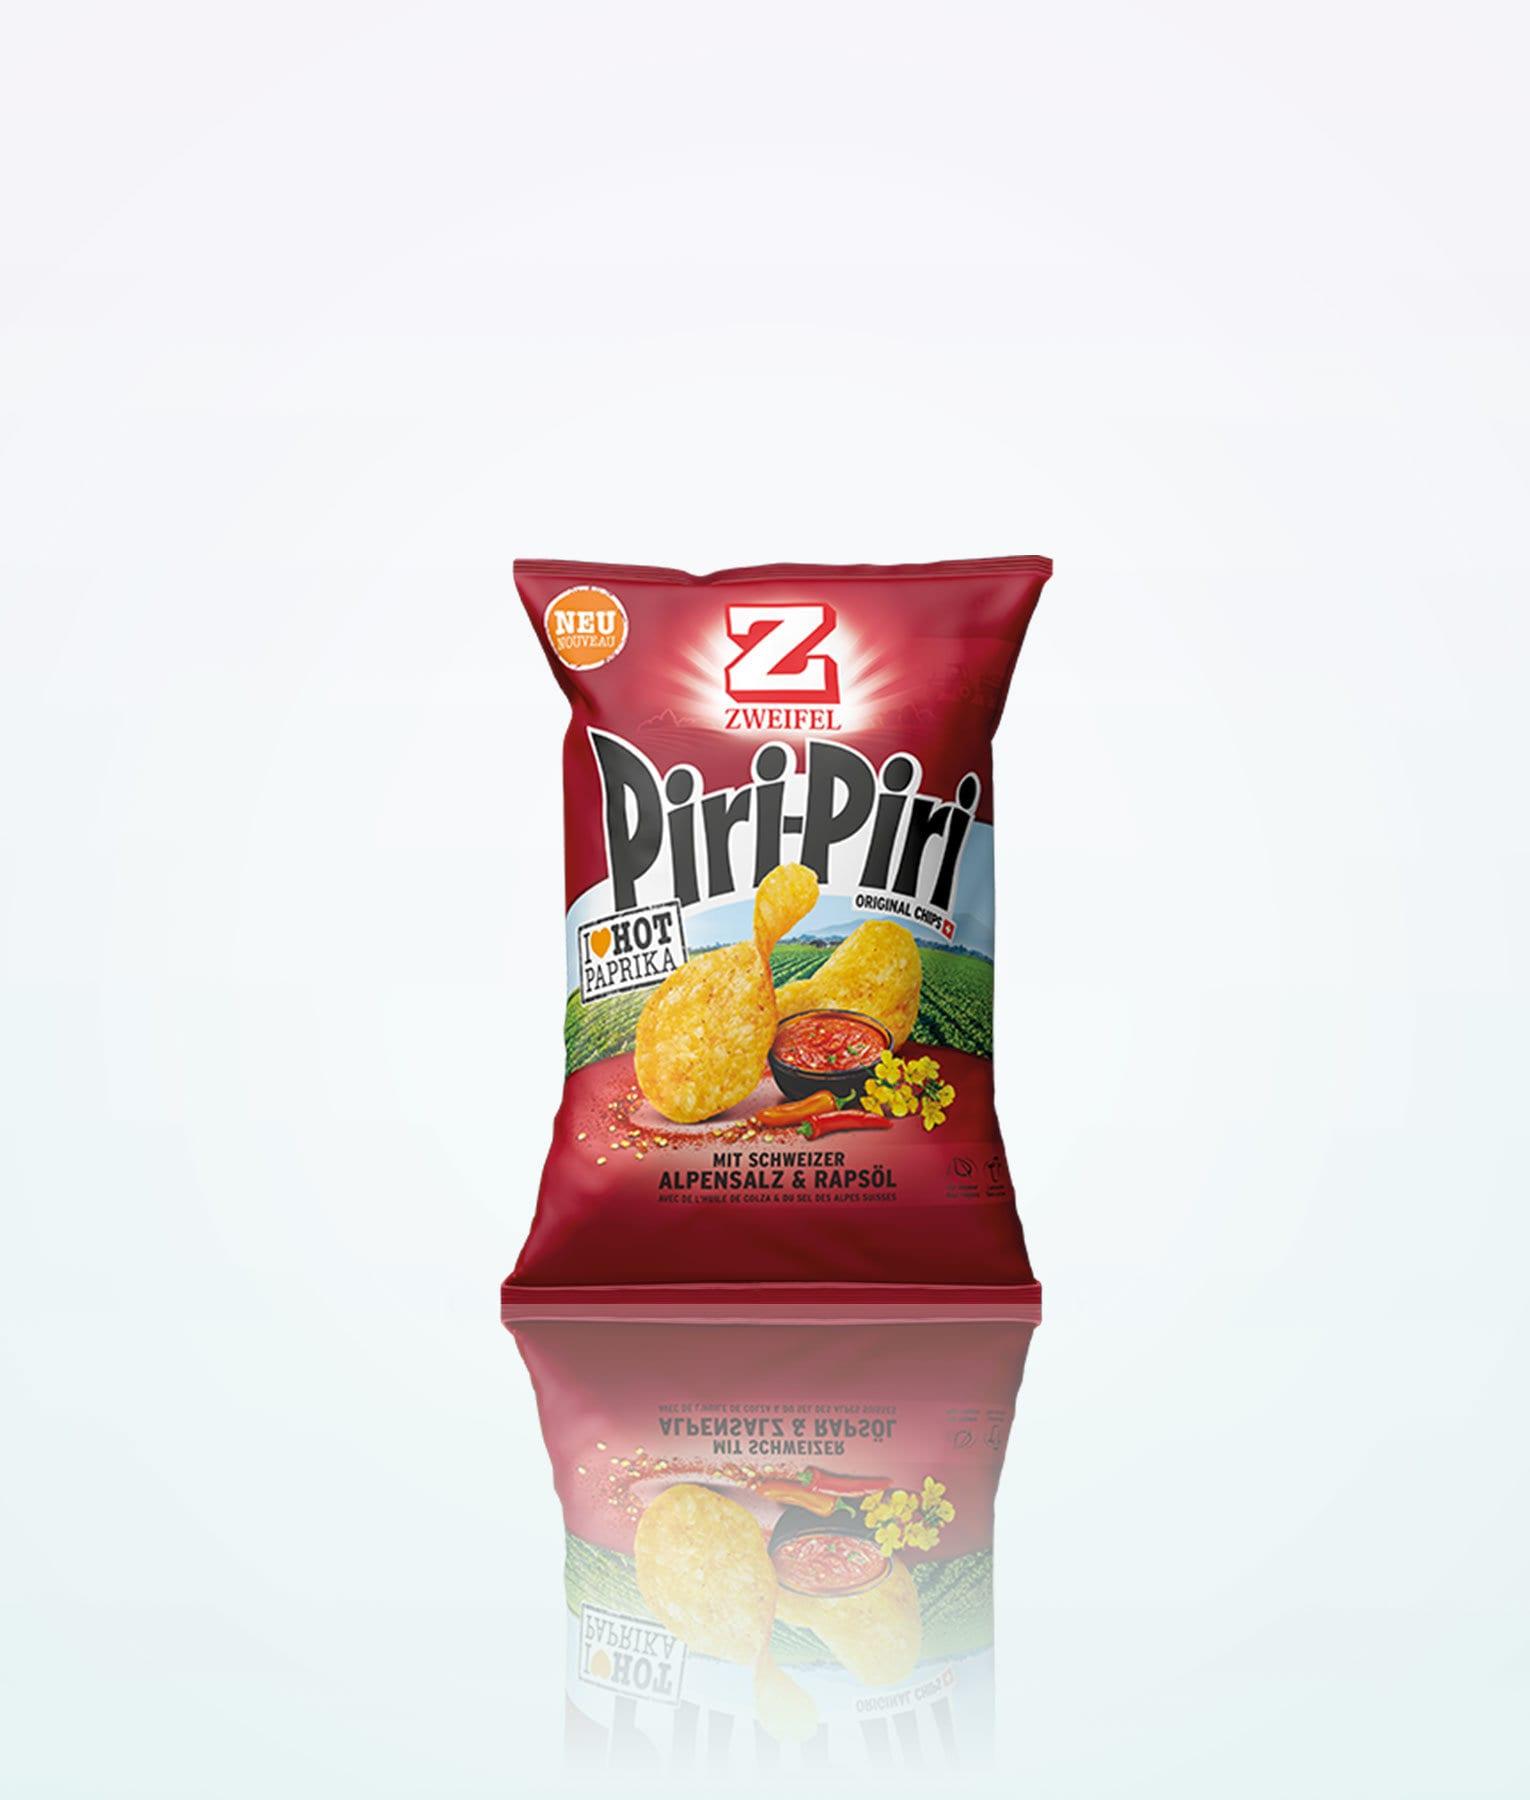 zweifel-piri-piri-hot-paprika-chips-90g